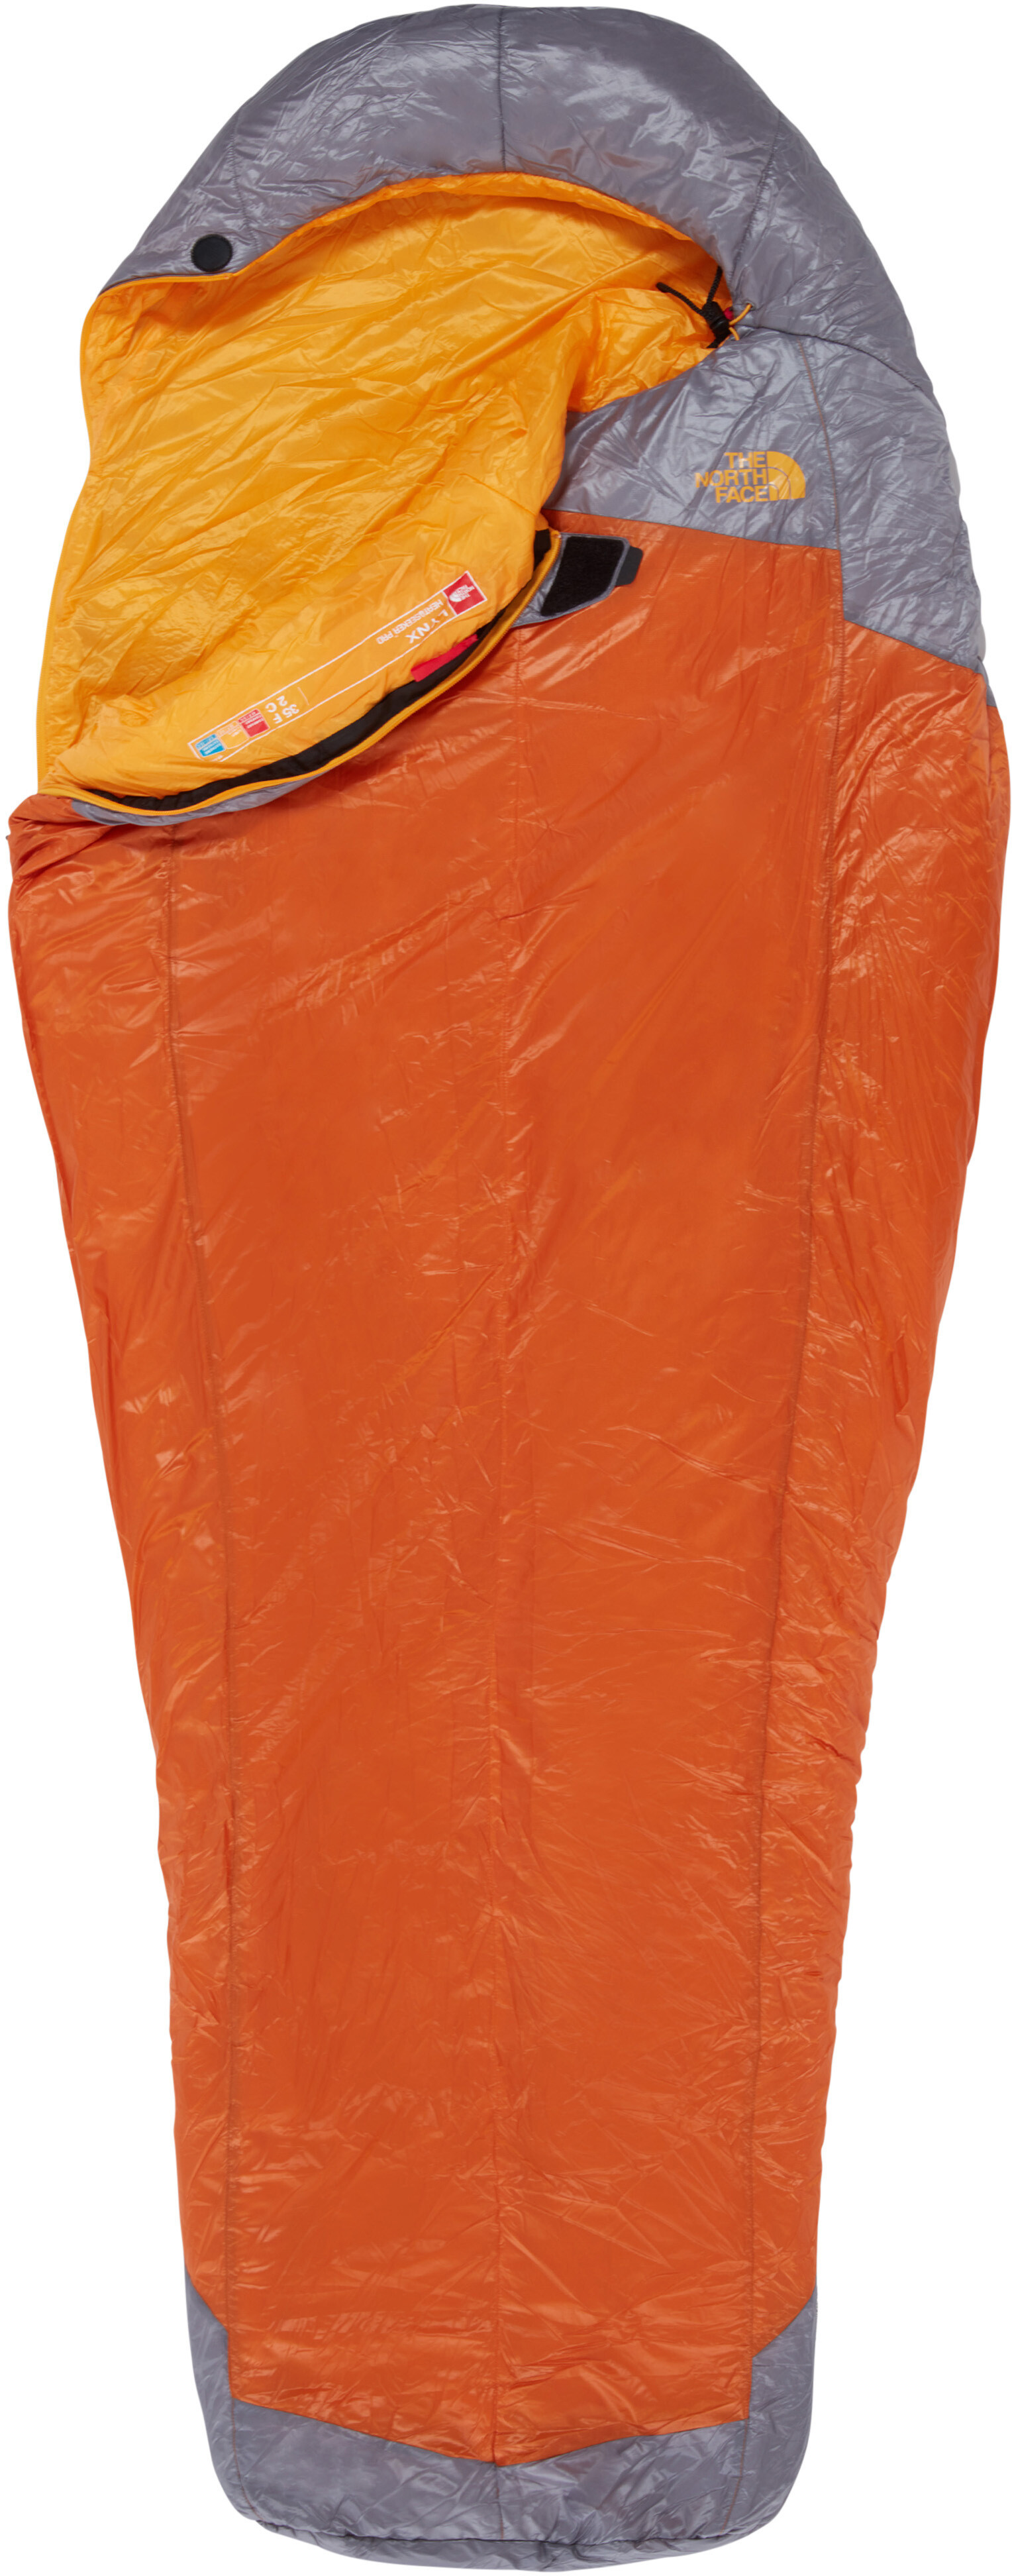 d0f7f95e7c The North Face Lynx - Sac de couchage - regular gris/orange ...